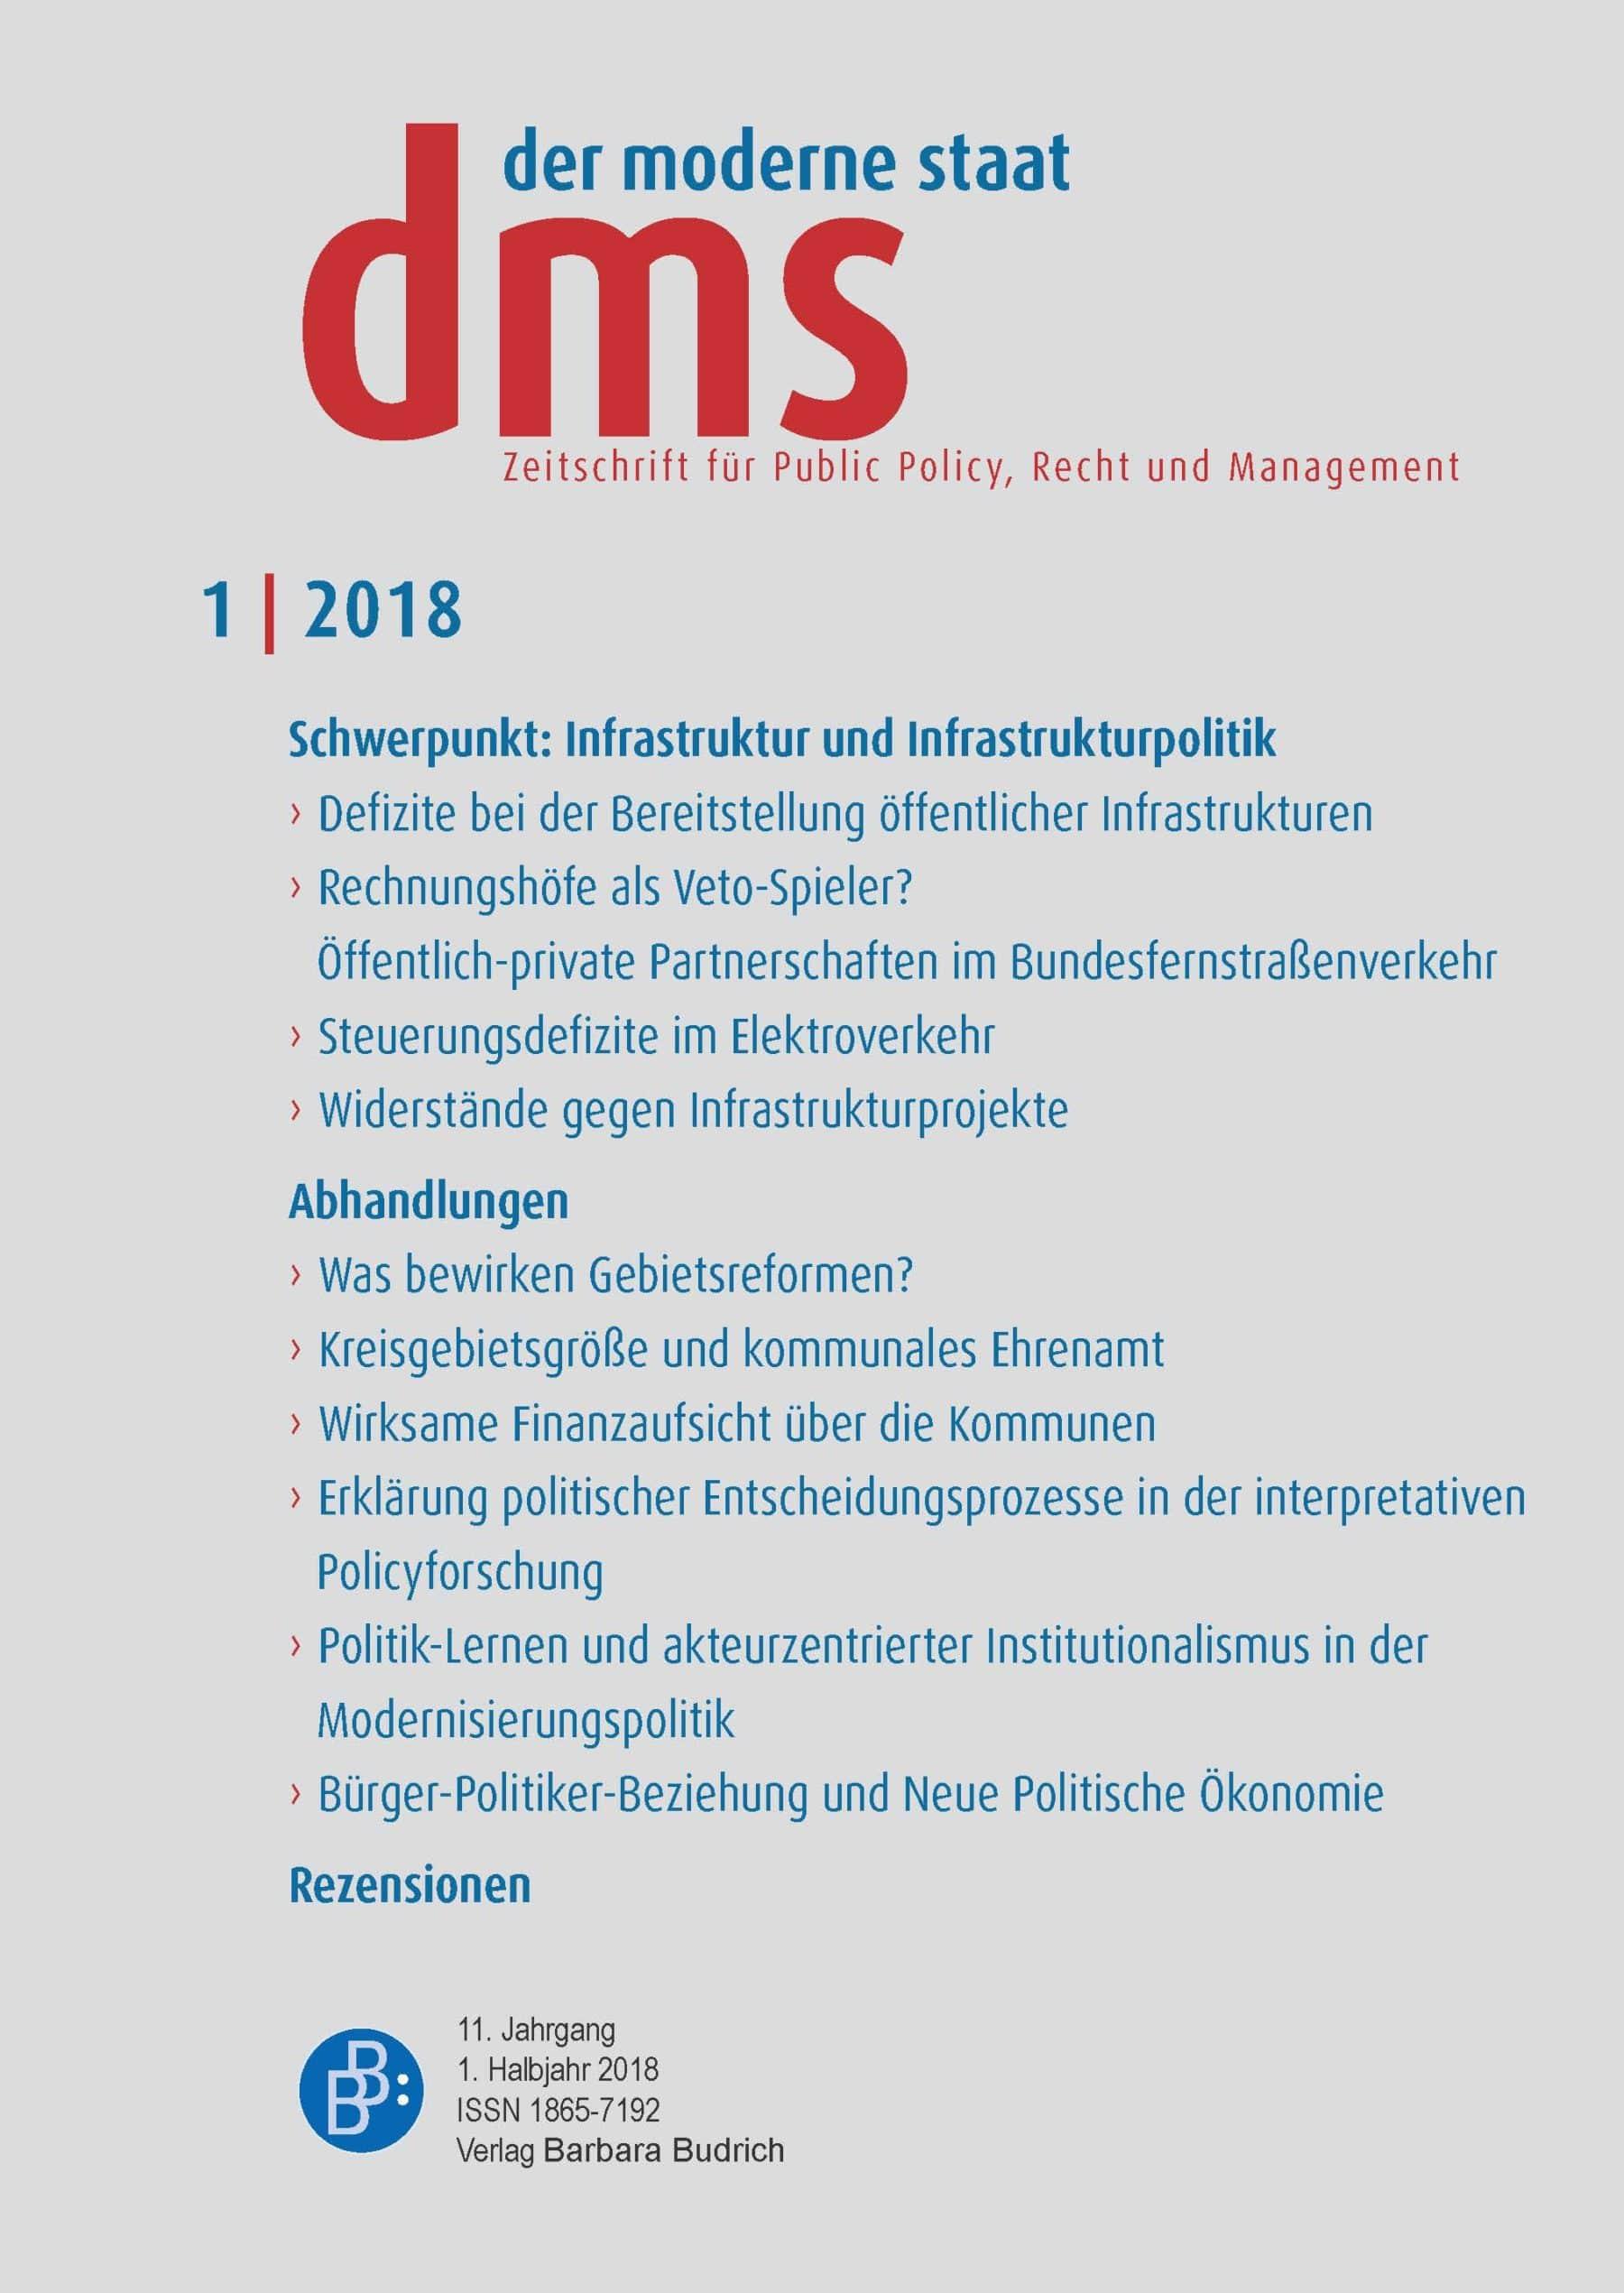 dms 1-2018 | Infrastruktur und Infrastrukturpolitik